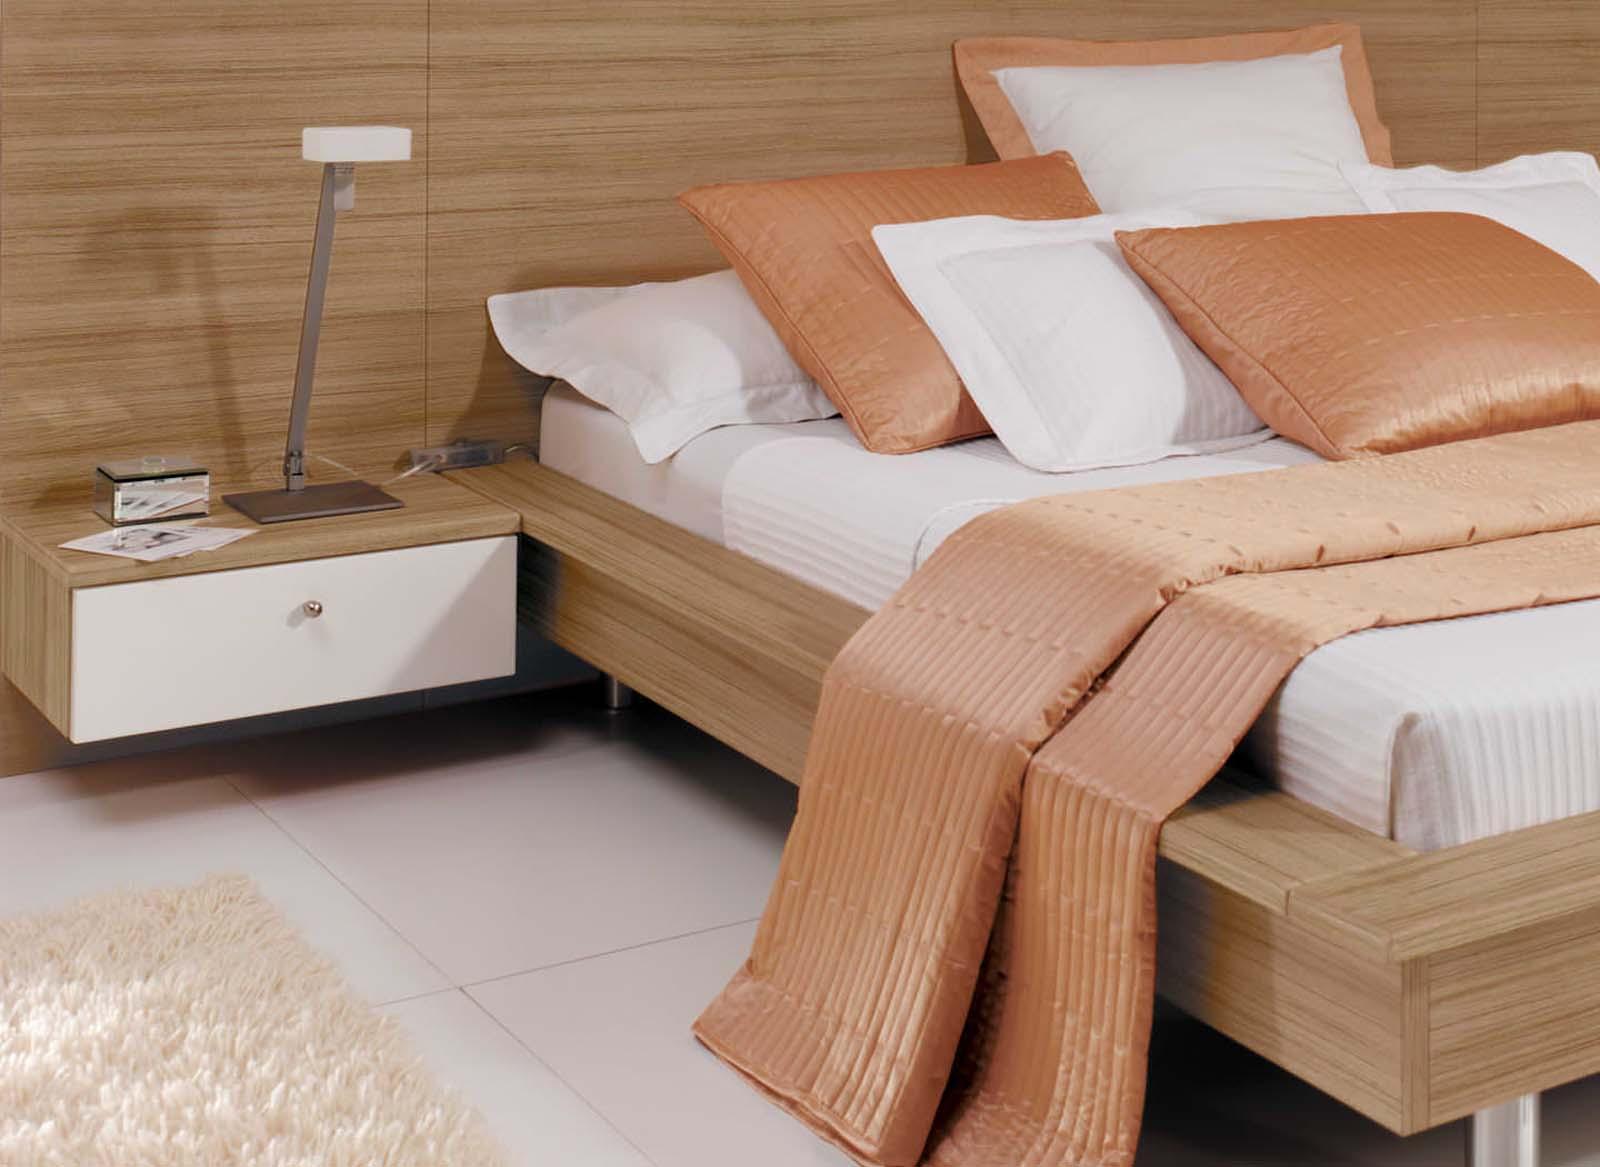 Portofino High Gloss White & Granadillo Strachan Bedroom